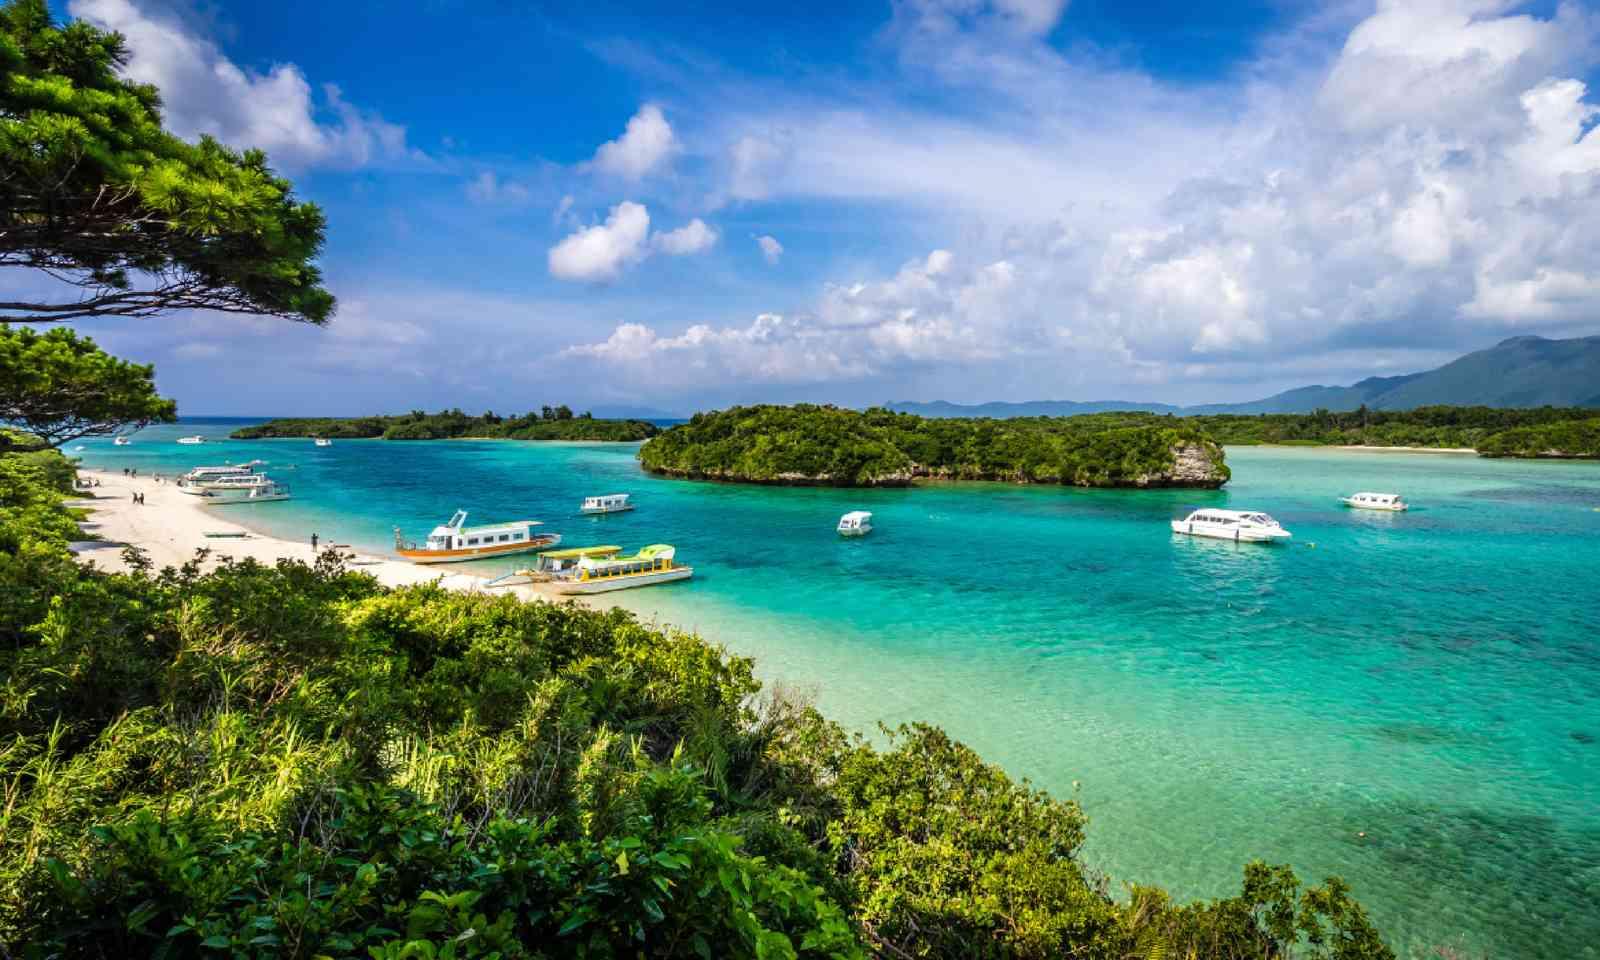 White sand beach at tropical island of Ishigaki Okinawa Japan (Shutterstock)